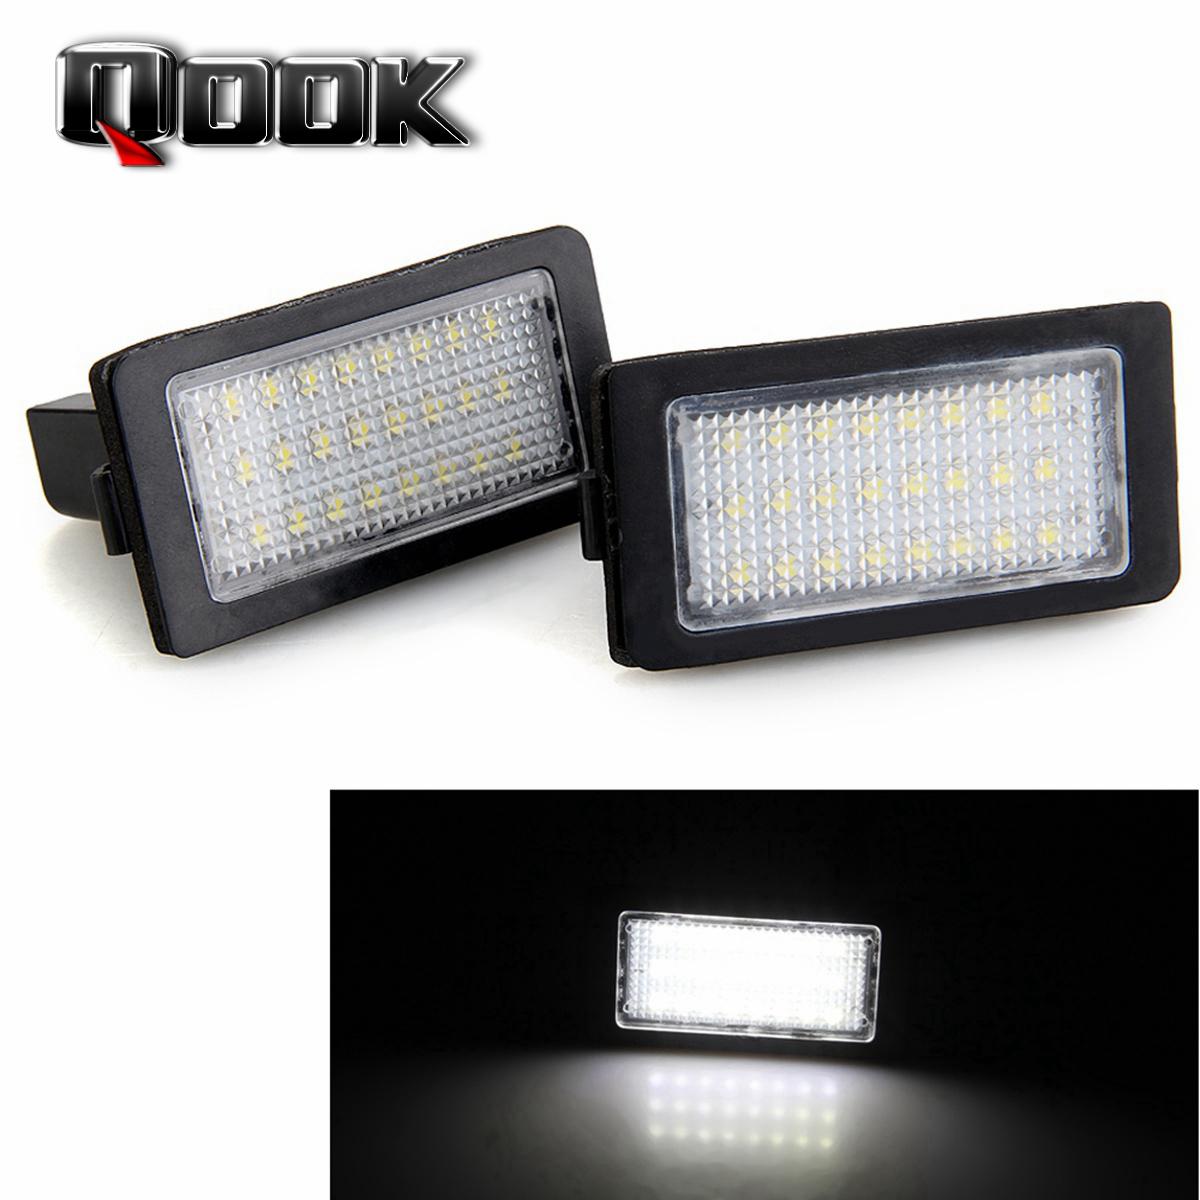 Qook 2piece 24 LED 3528 SMD DC 12V License Plate Light Lamp White for BMW E38(China (Mainland))